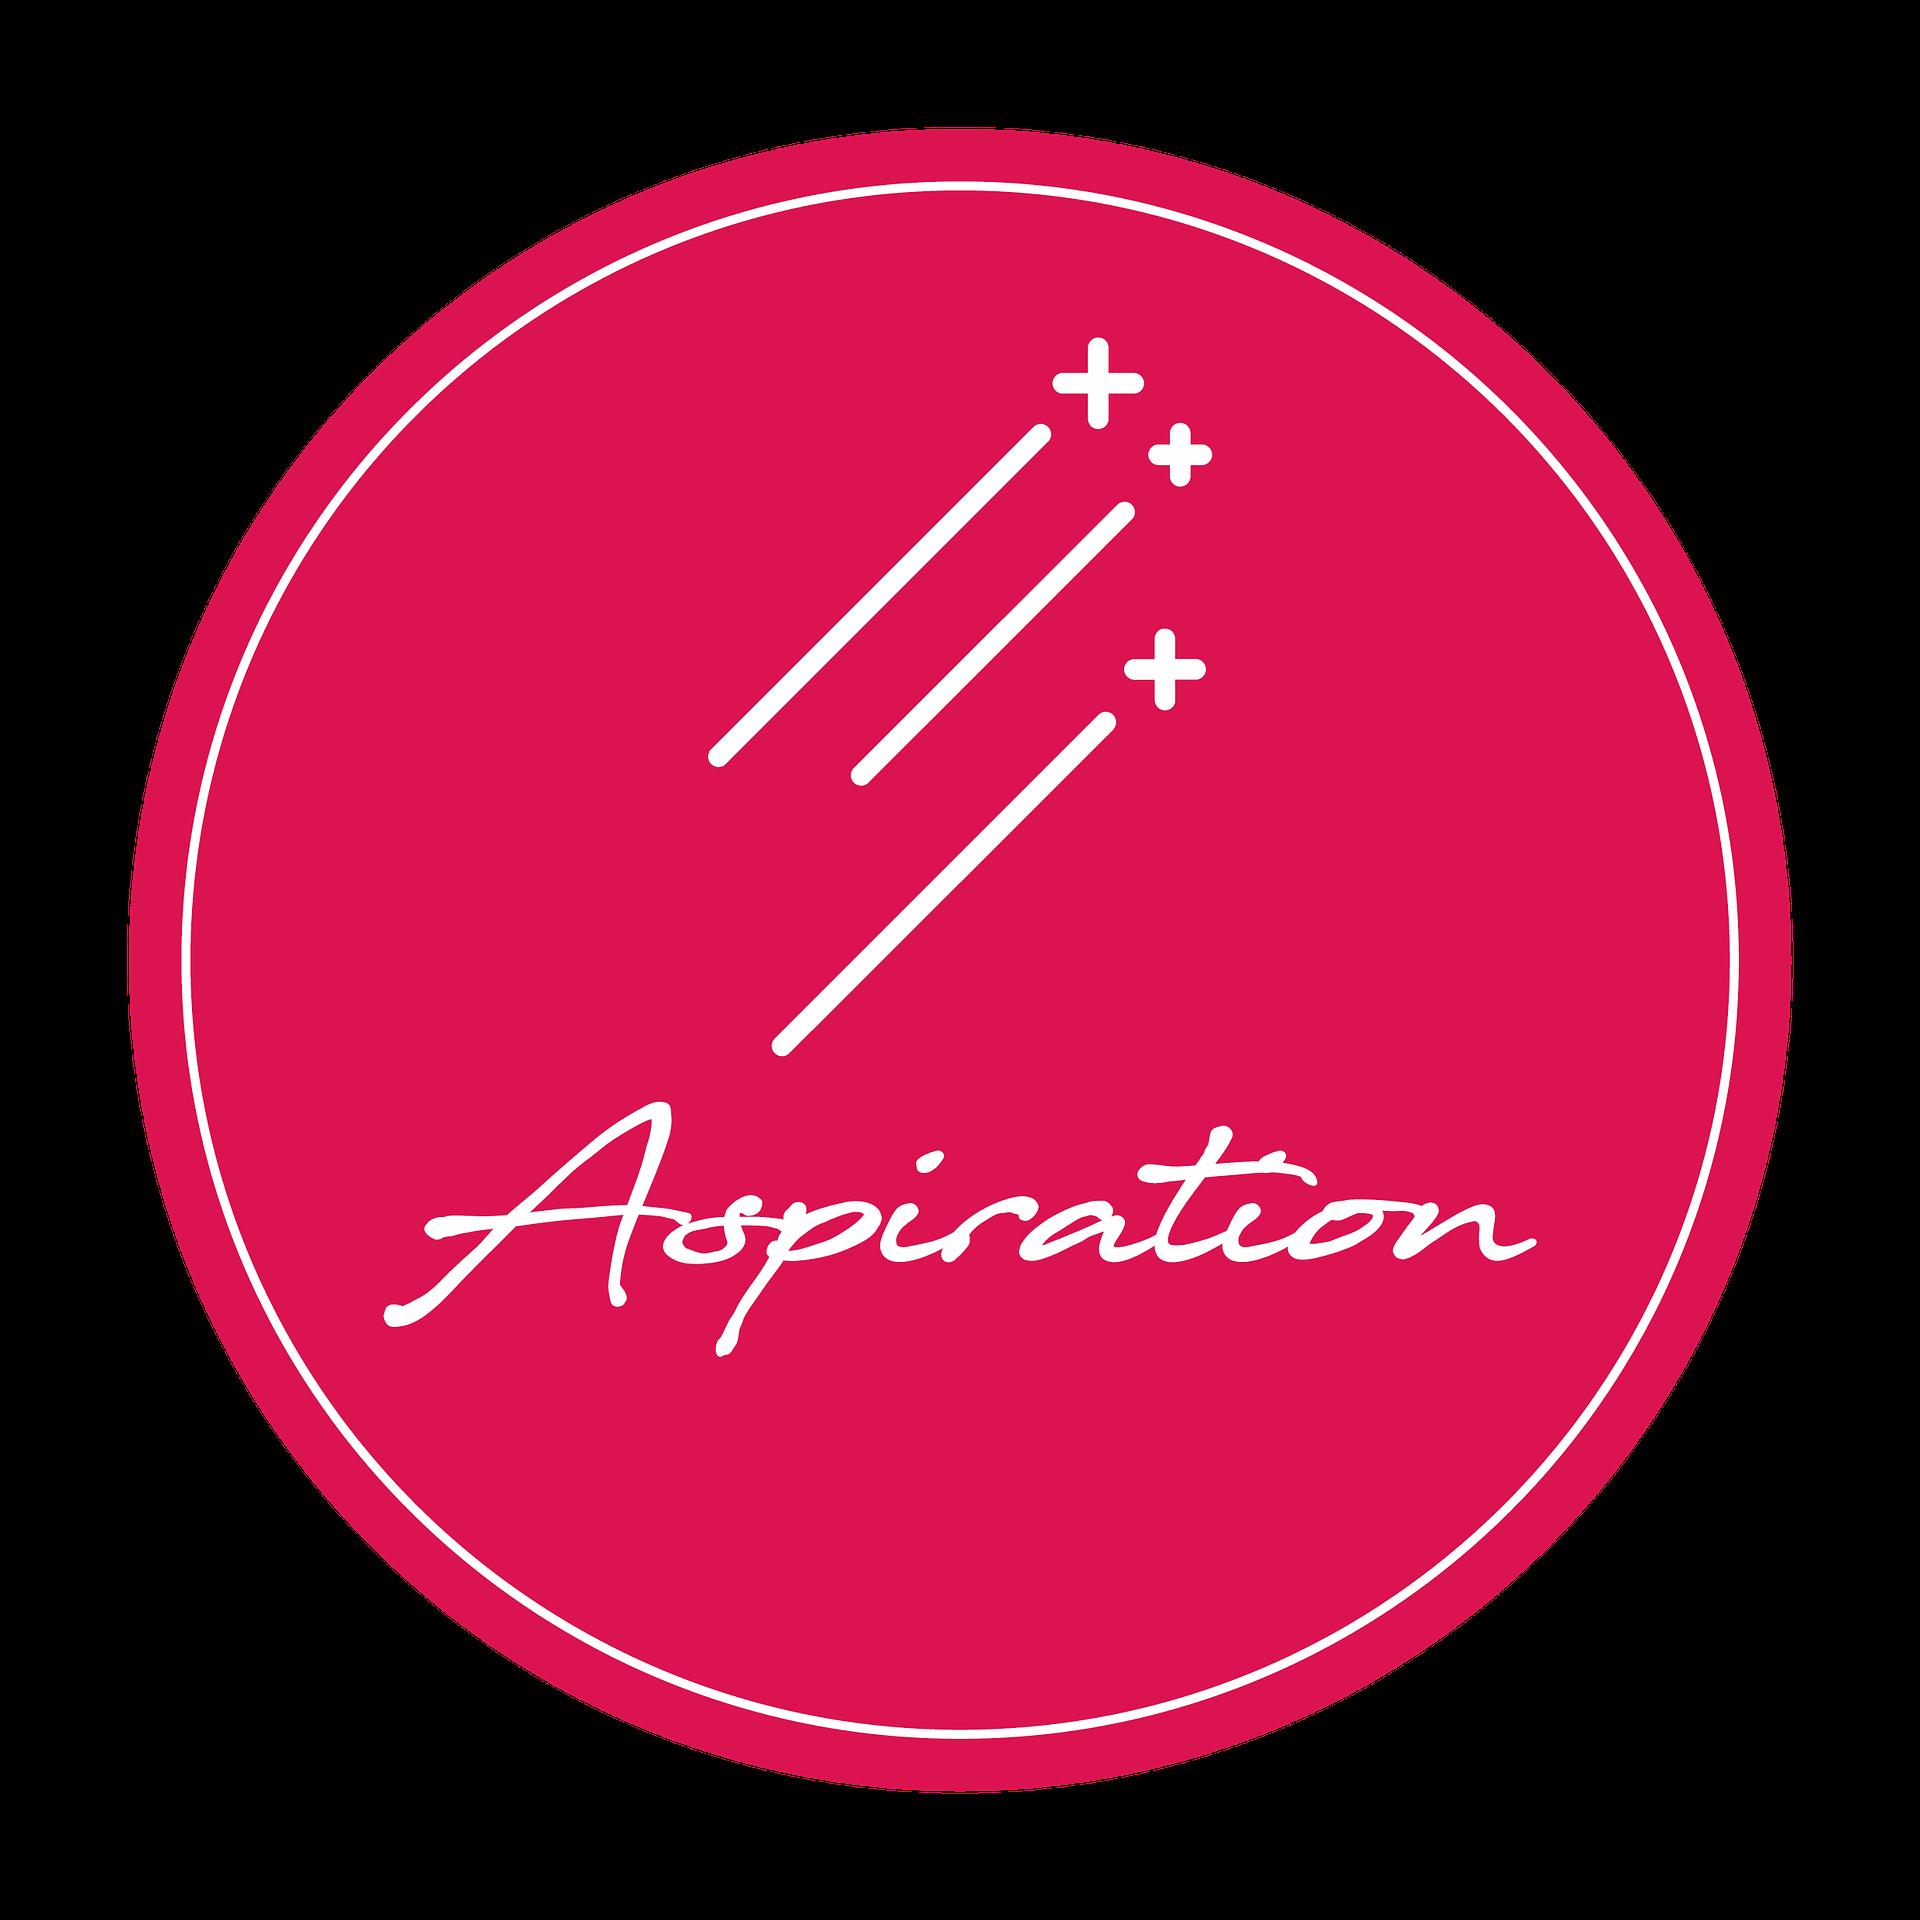 aspiration value logo